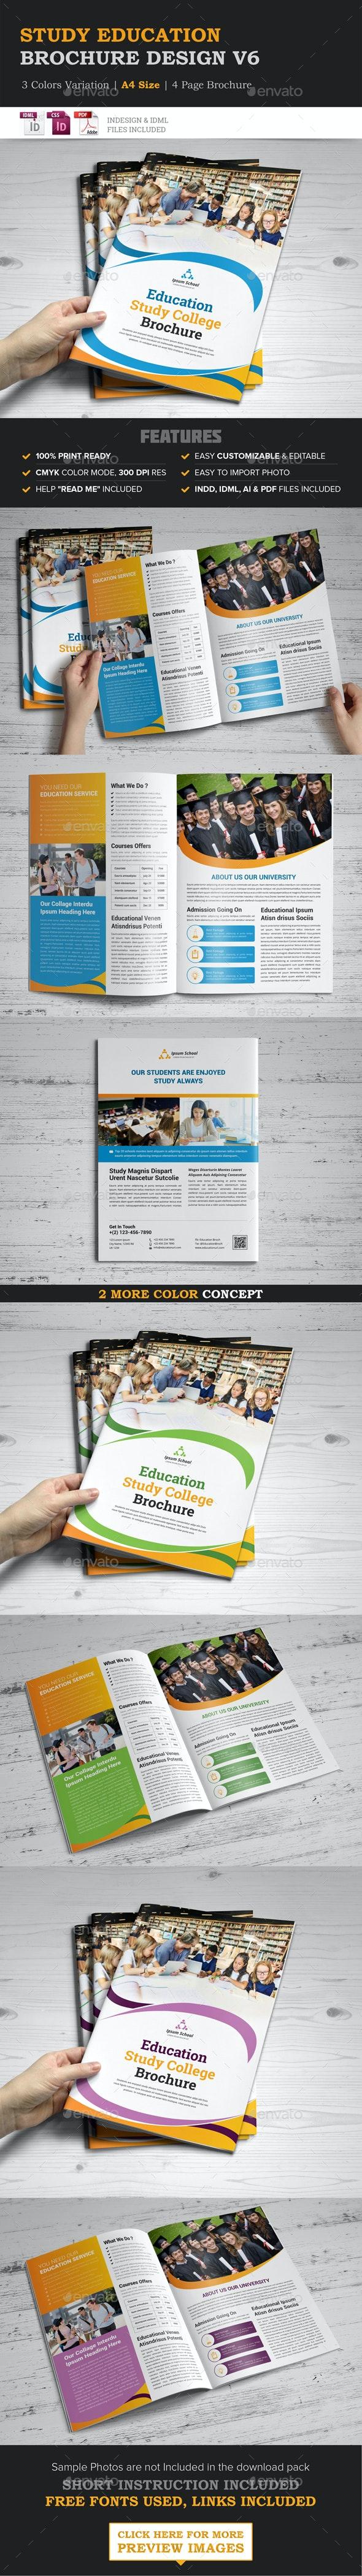 Education Brochure Indesign Template - Brochures Print Templates